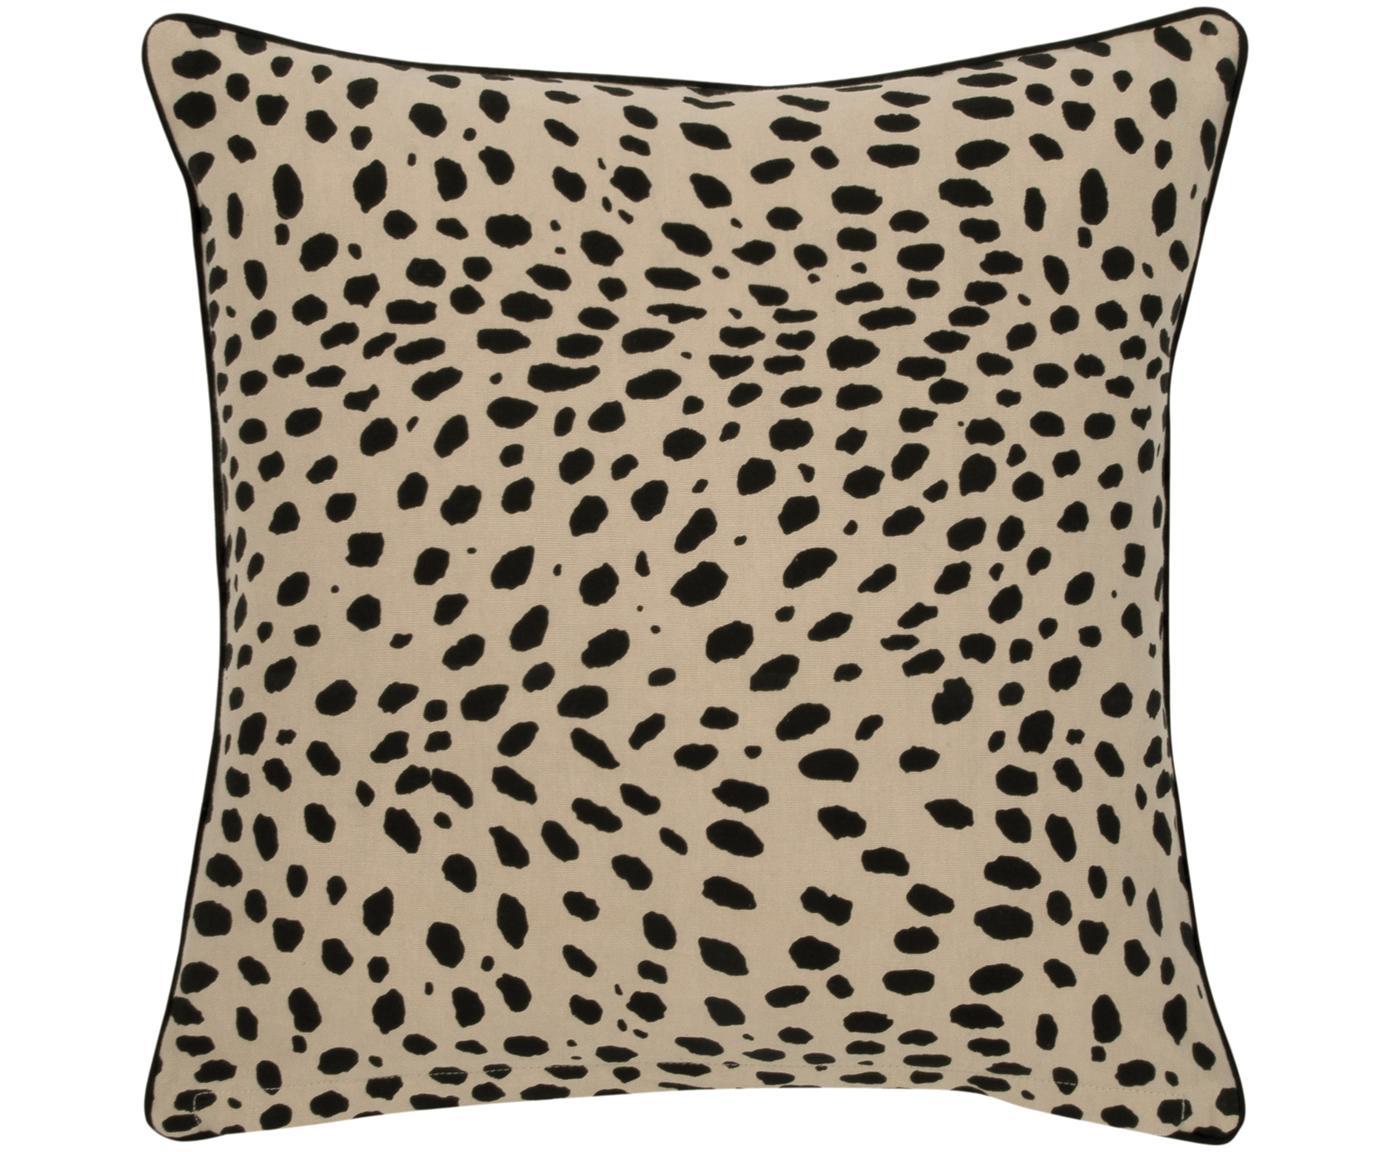 Funda de cojín Leopard, Algodón, Beige, negro, An 45 x L 45 cm